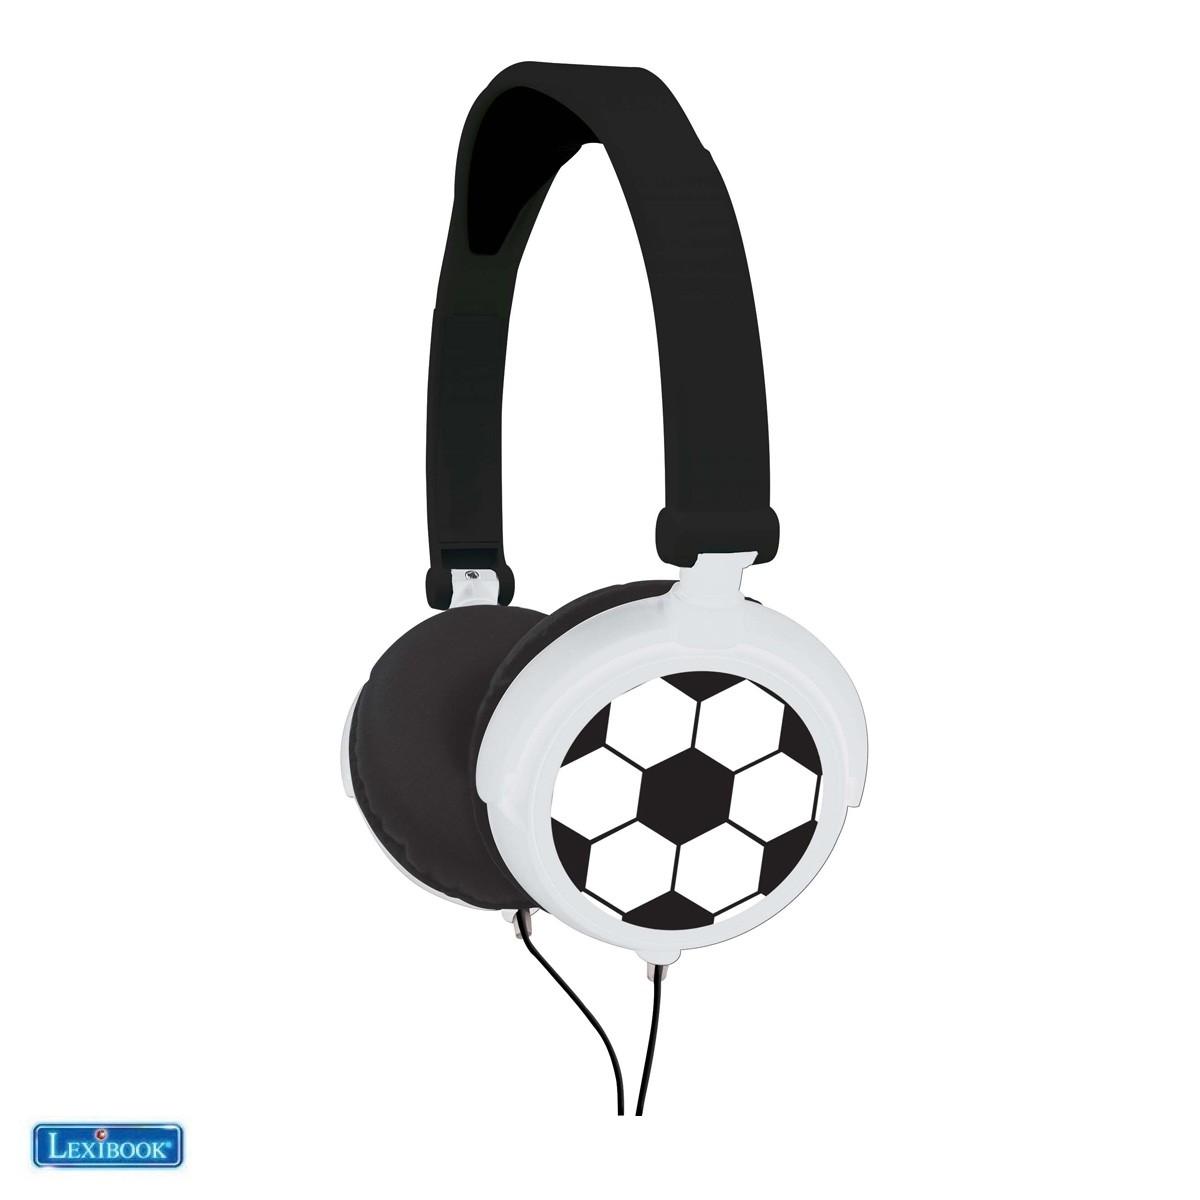 Casque audio stéréo football - Lexibook HP015FO